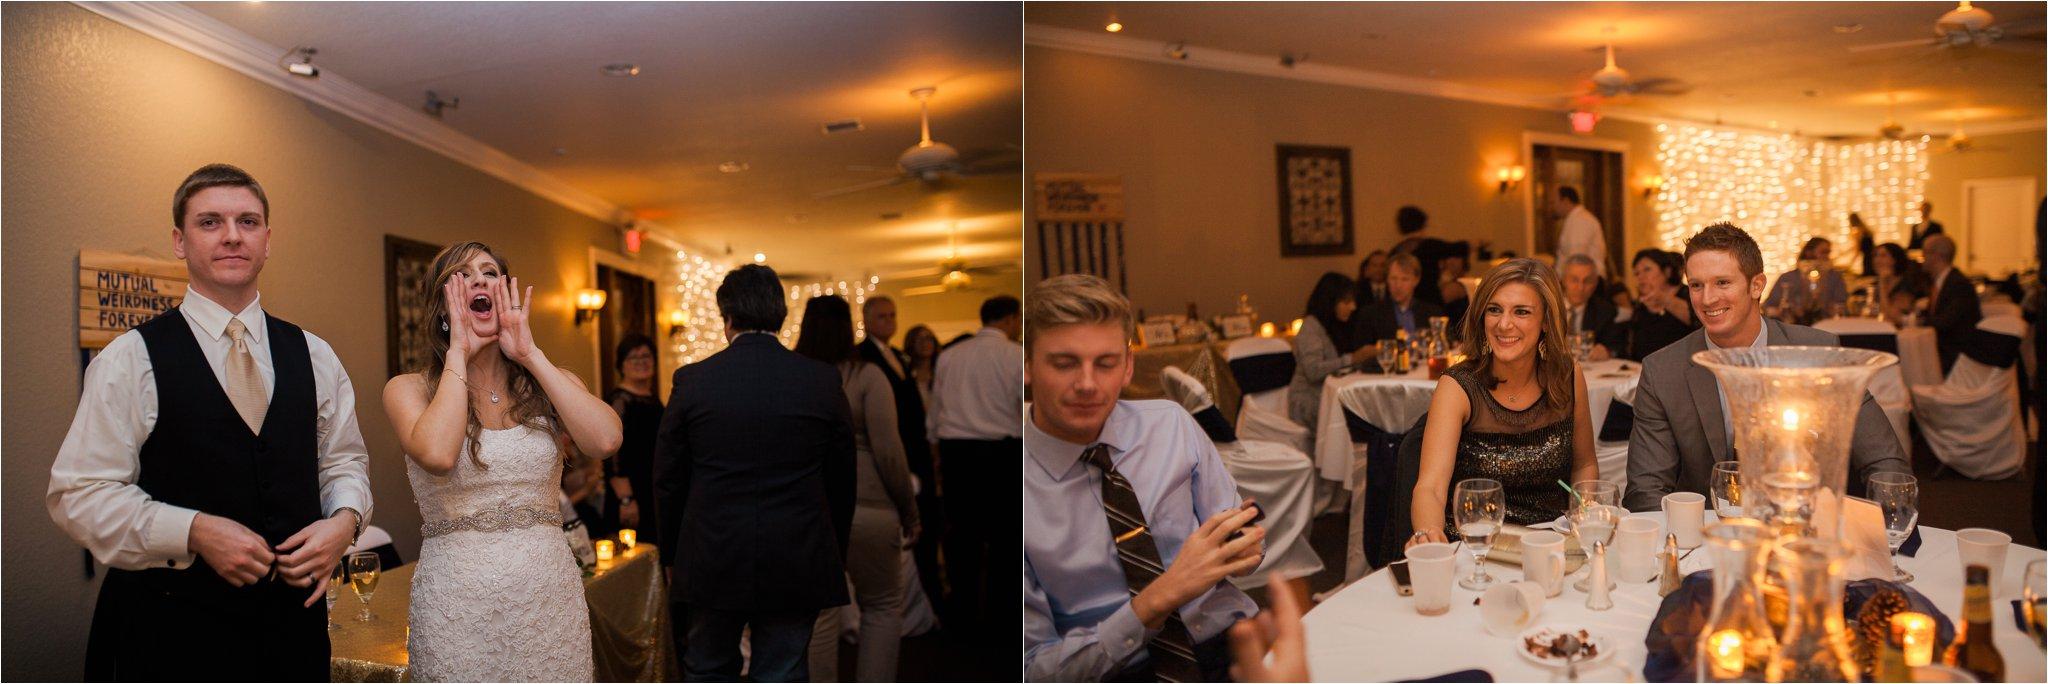 lunsford-wedding-990.jpg